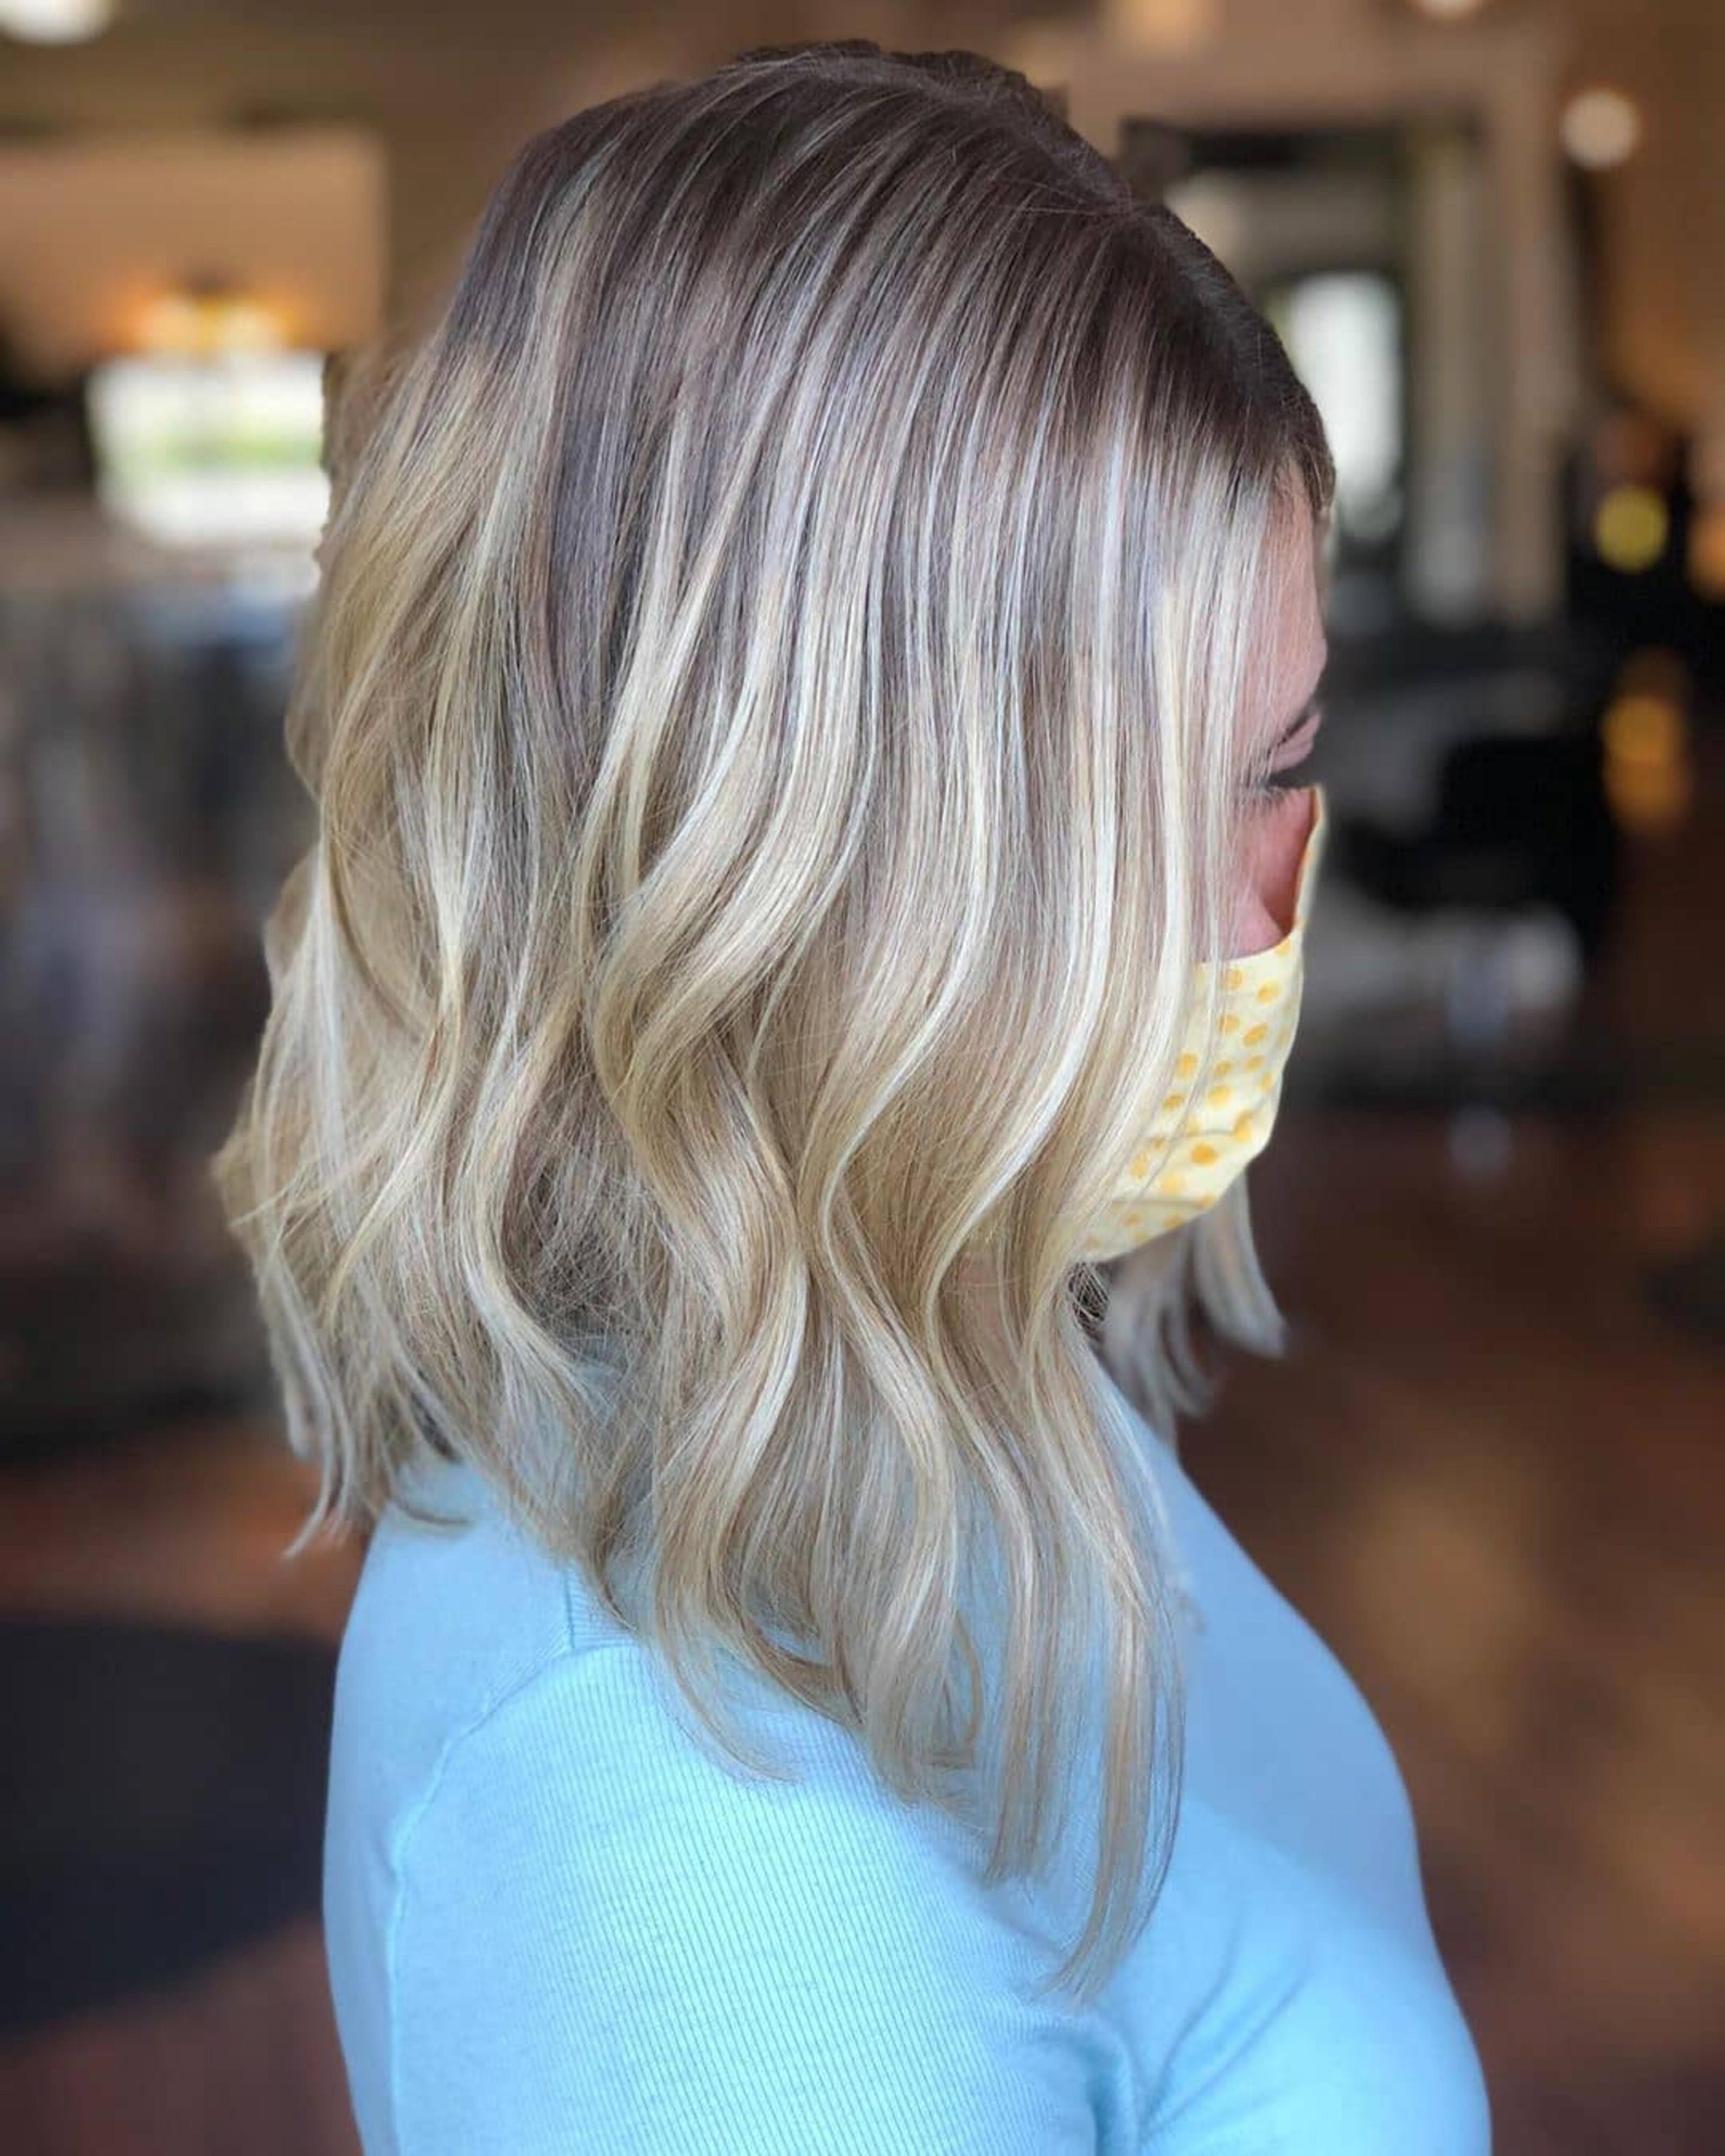 A layered bob of blonde balayage color.